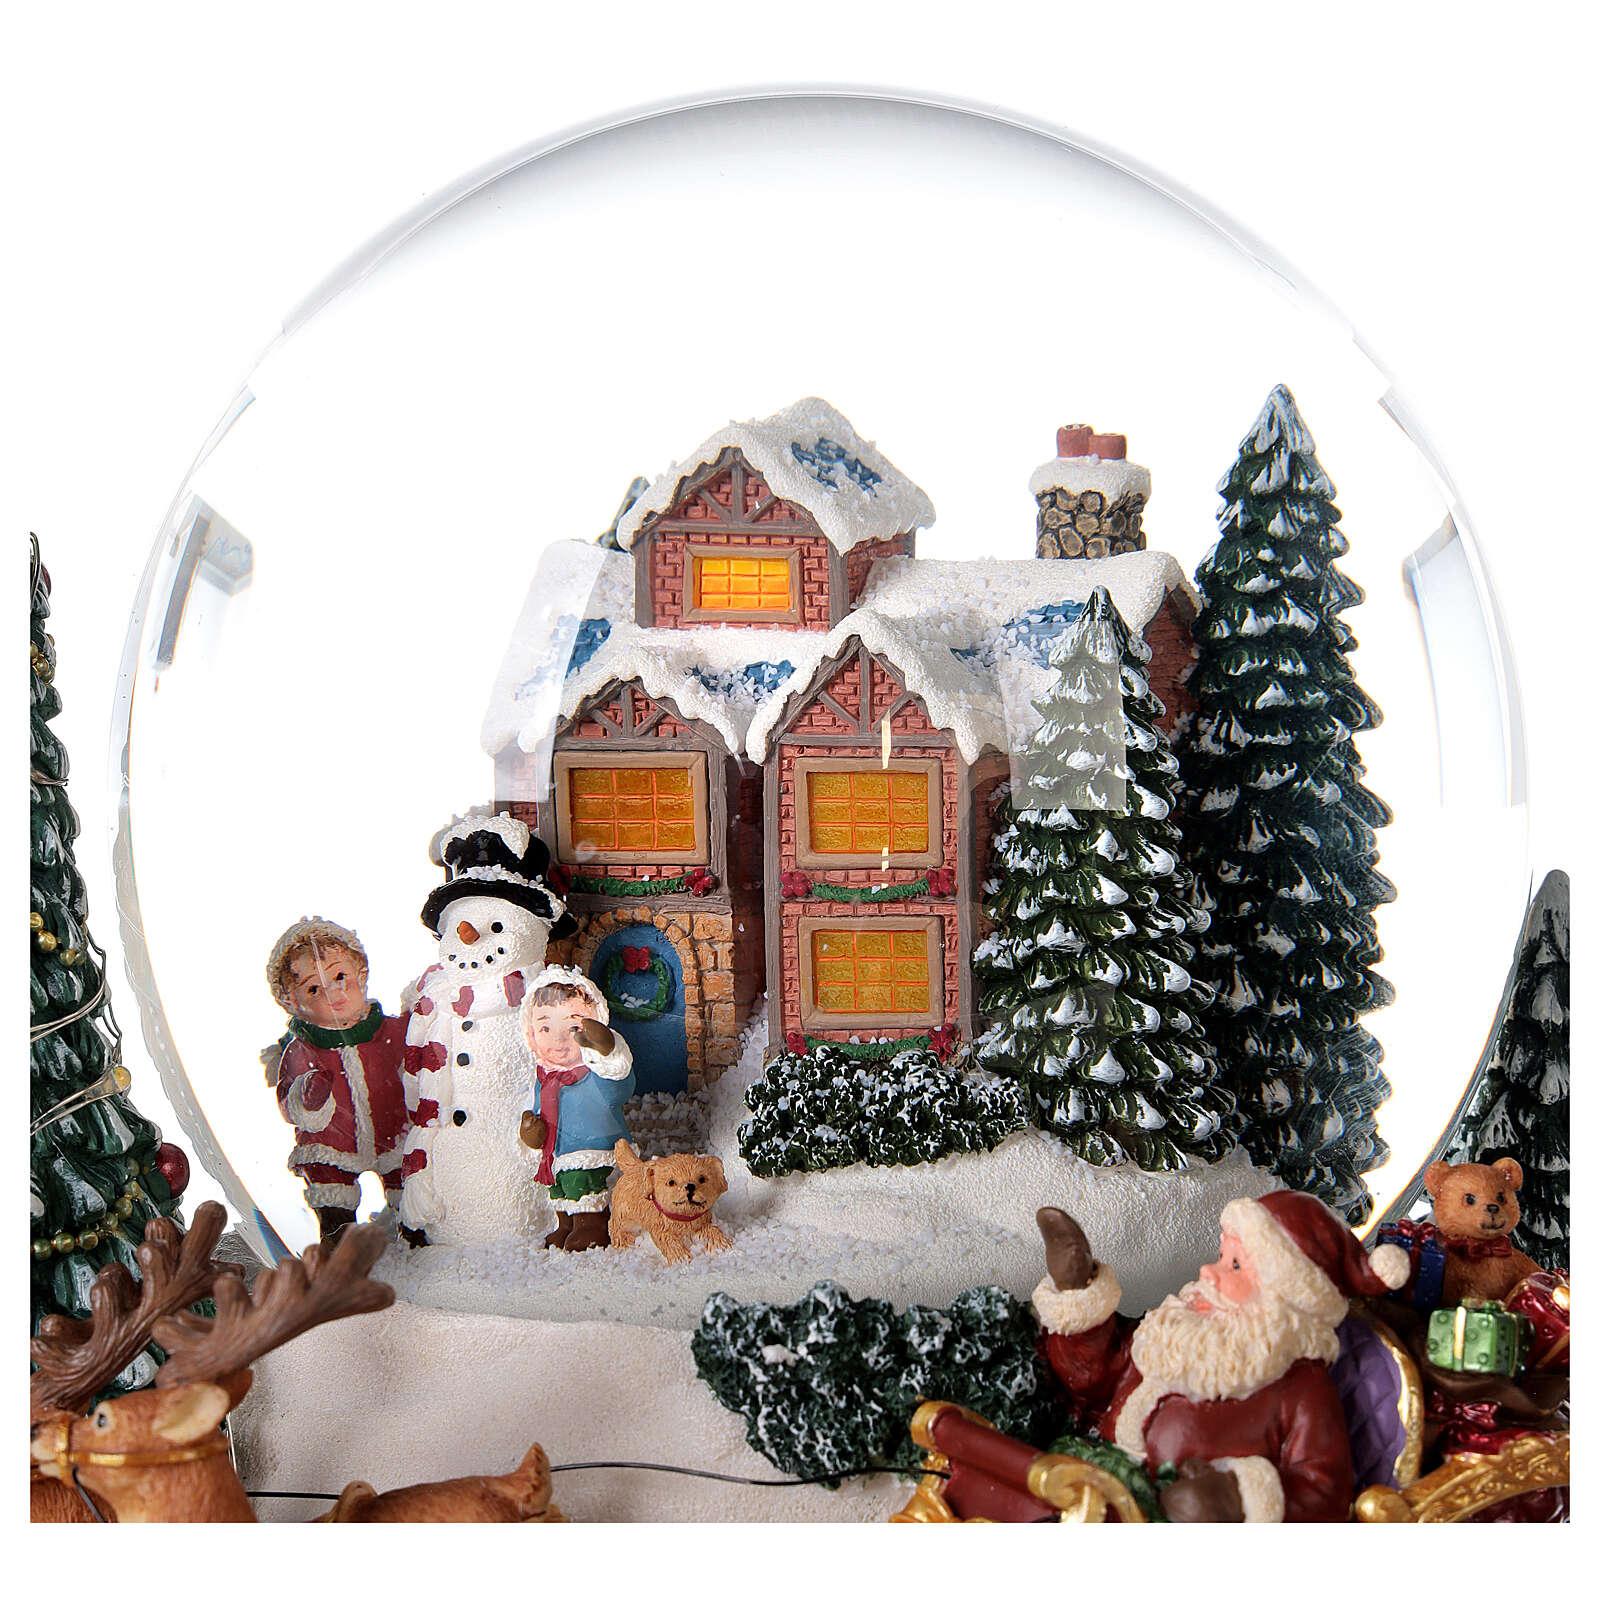 Christmas snow globe Santa Claus sleigh music lights 20x20x20 cm 3